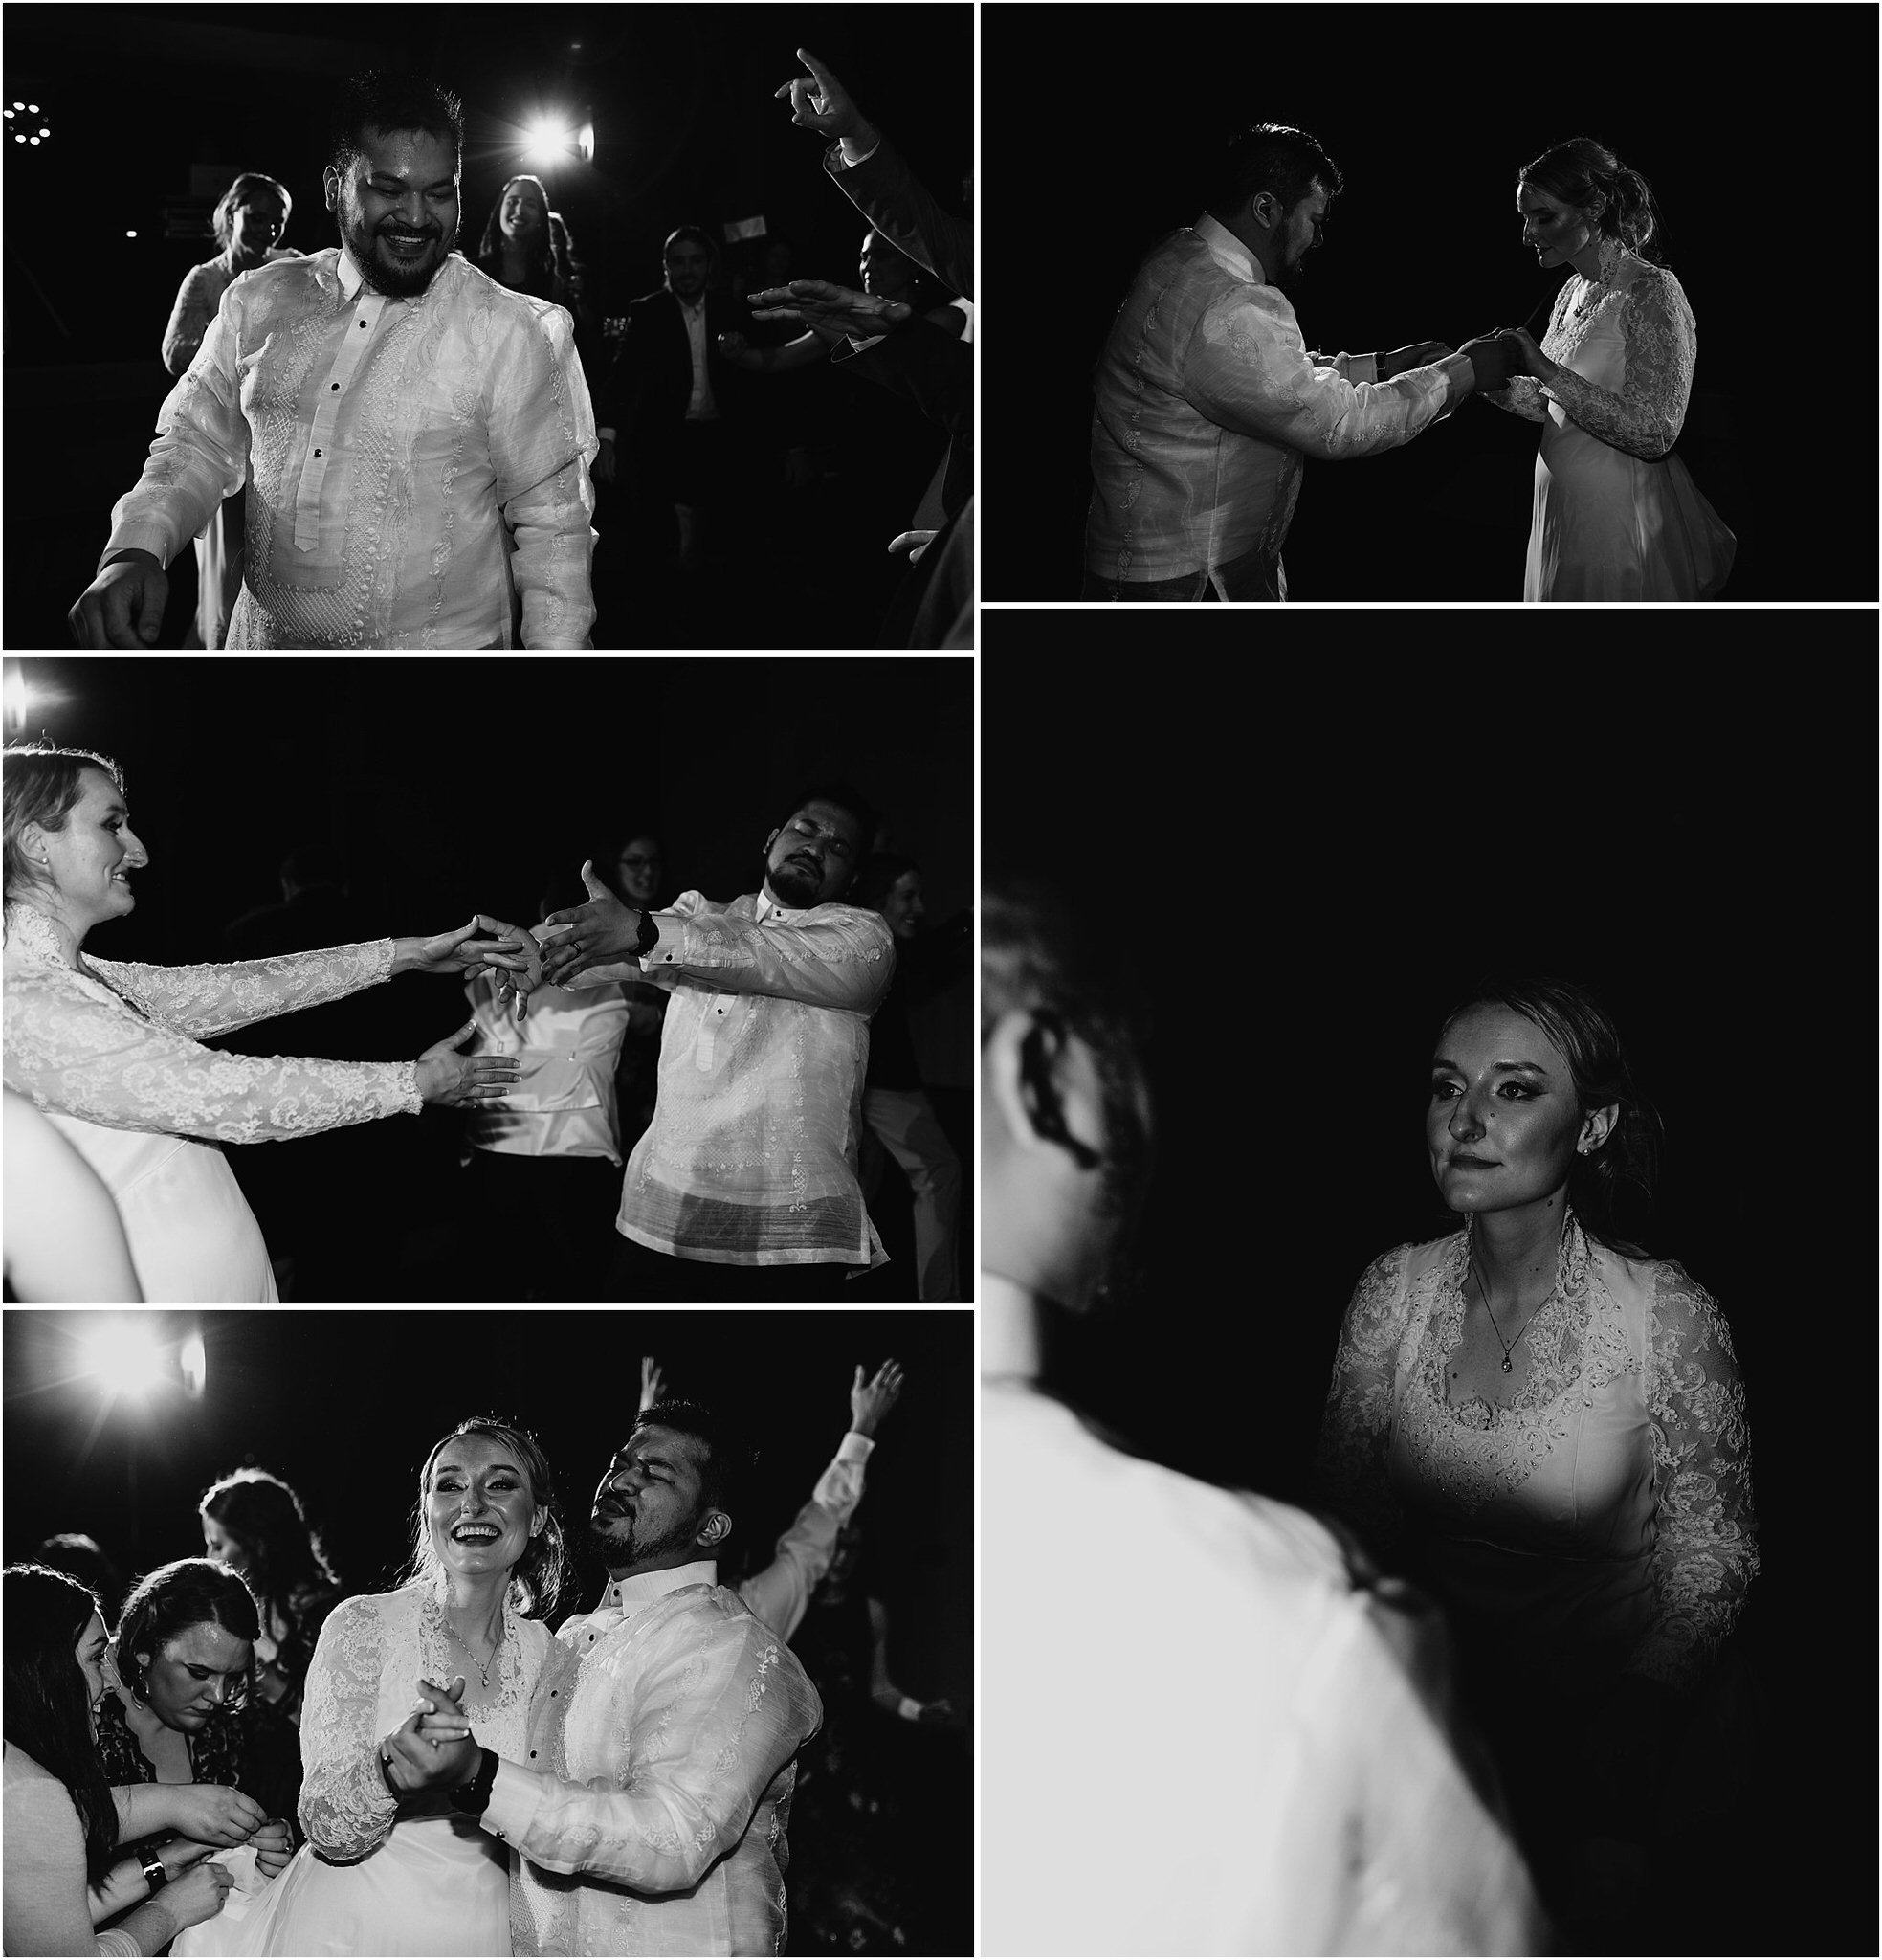 katy-robin-married-in-mukilteo-wedding50.jpg